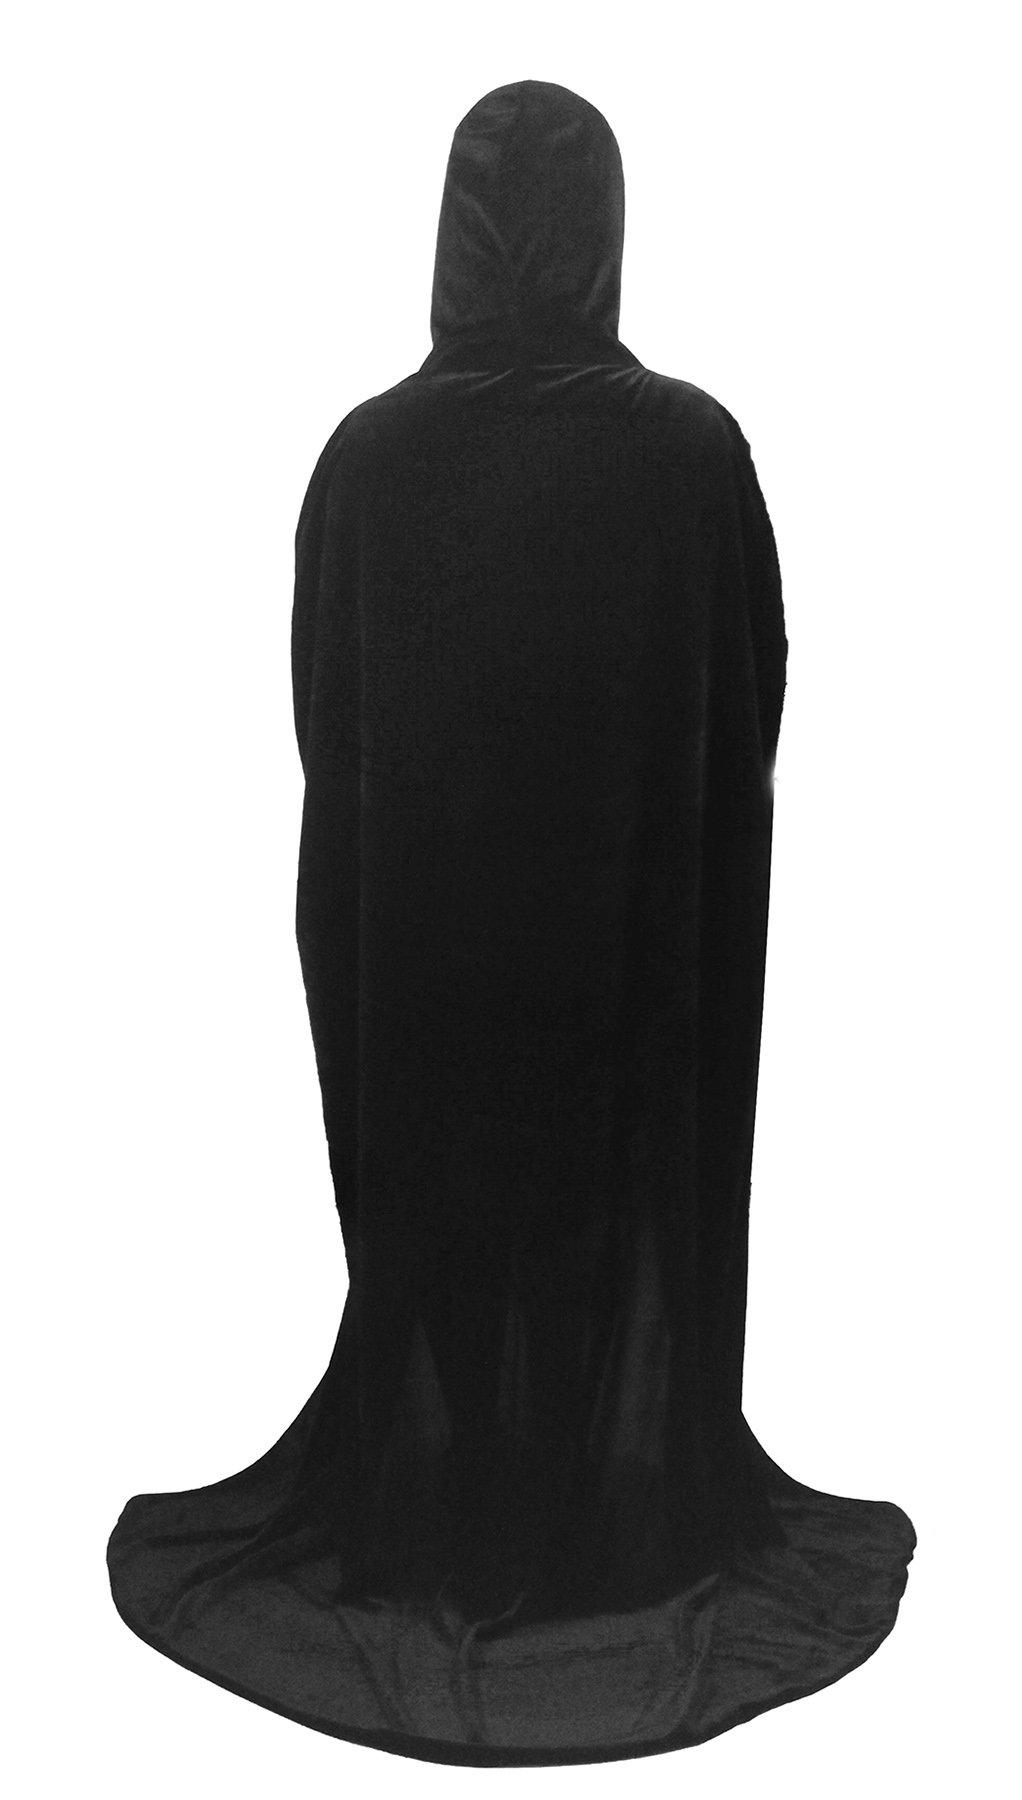 Beautifulfashionlife Unisex's Halloween Cloak Velvet Witch Cape with Hoodies Black,150cm